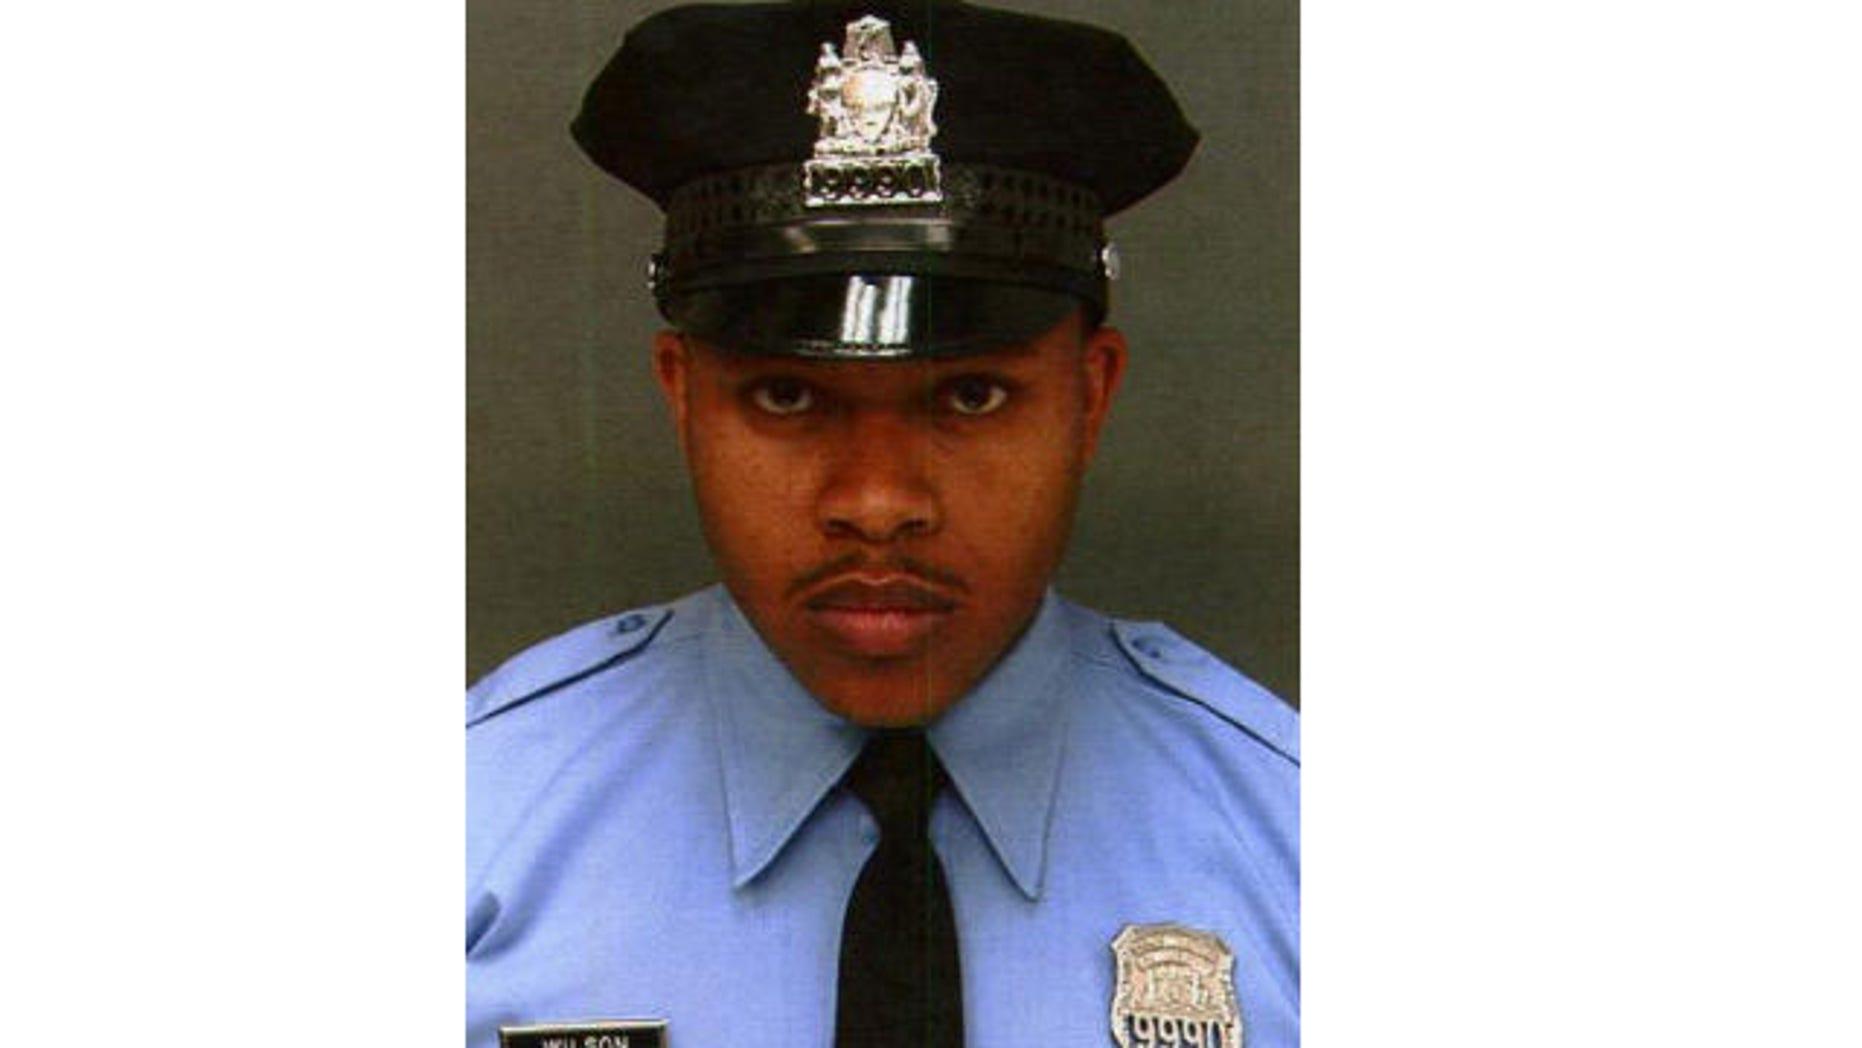 Officer Robert Wilson III was killed in a confrontation in Philadelphia.